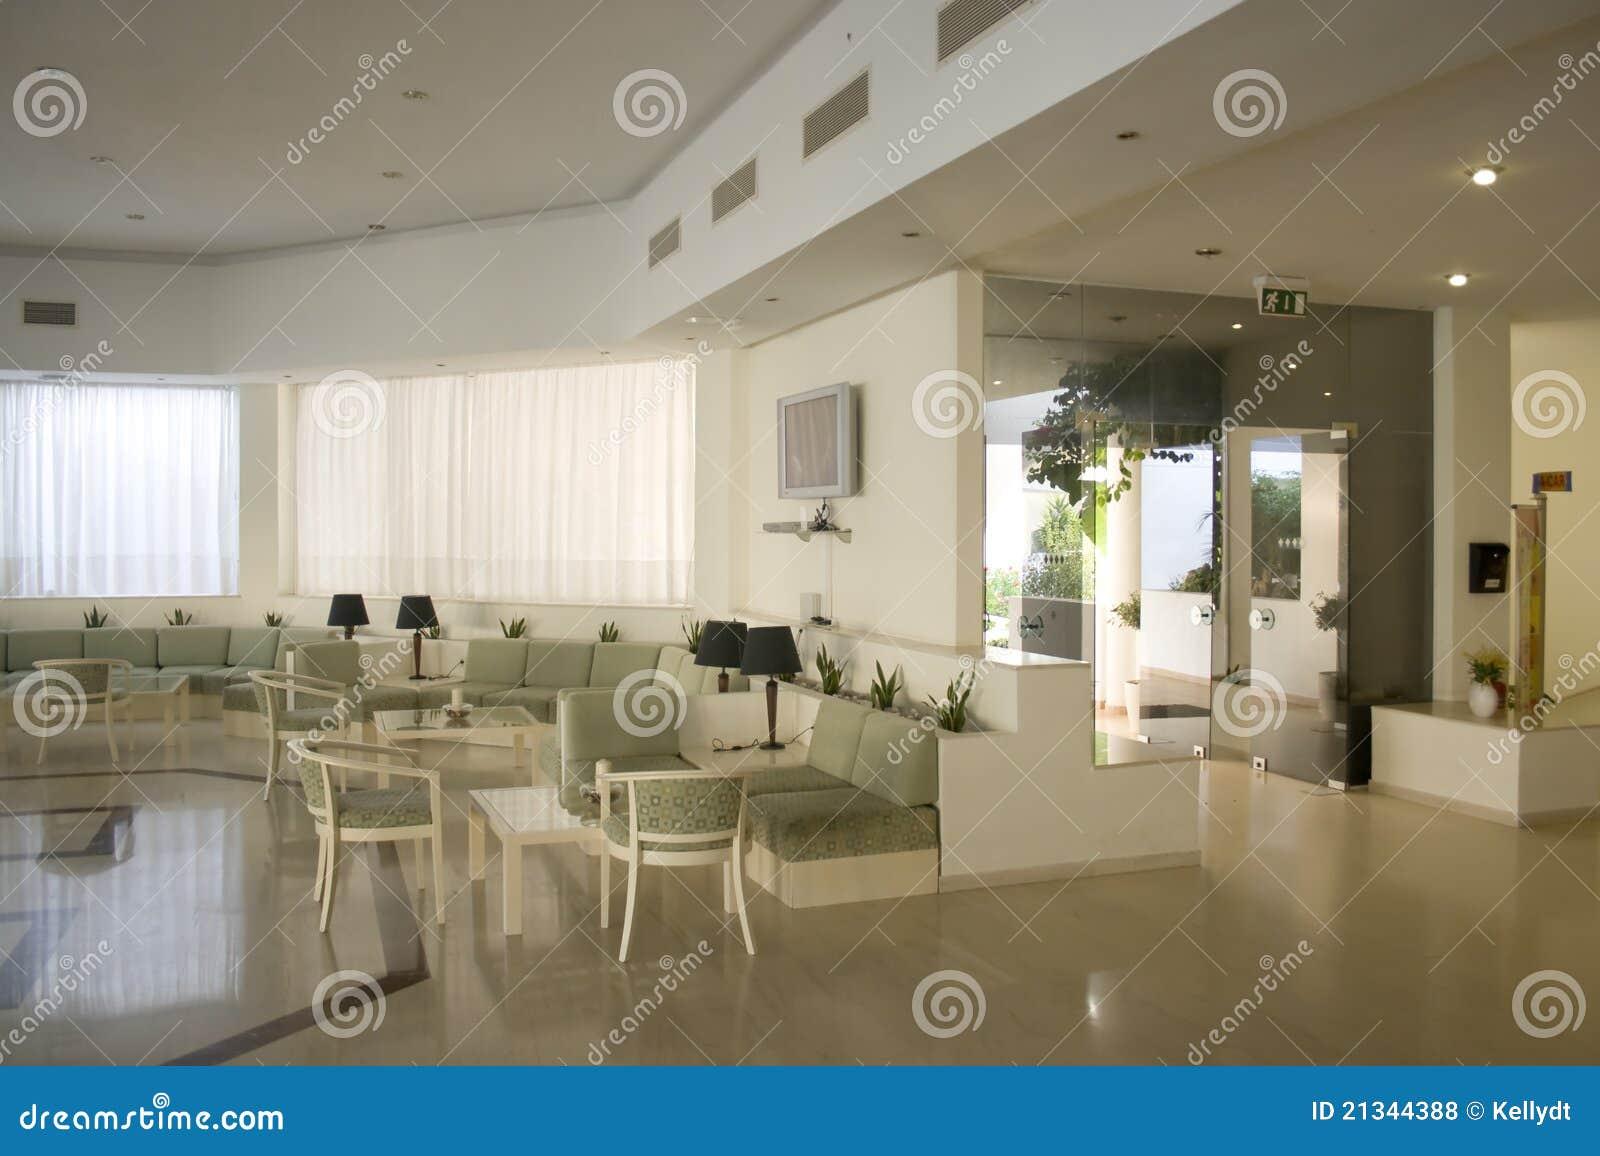 Foyeru hotel